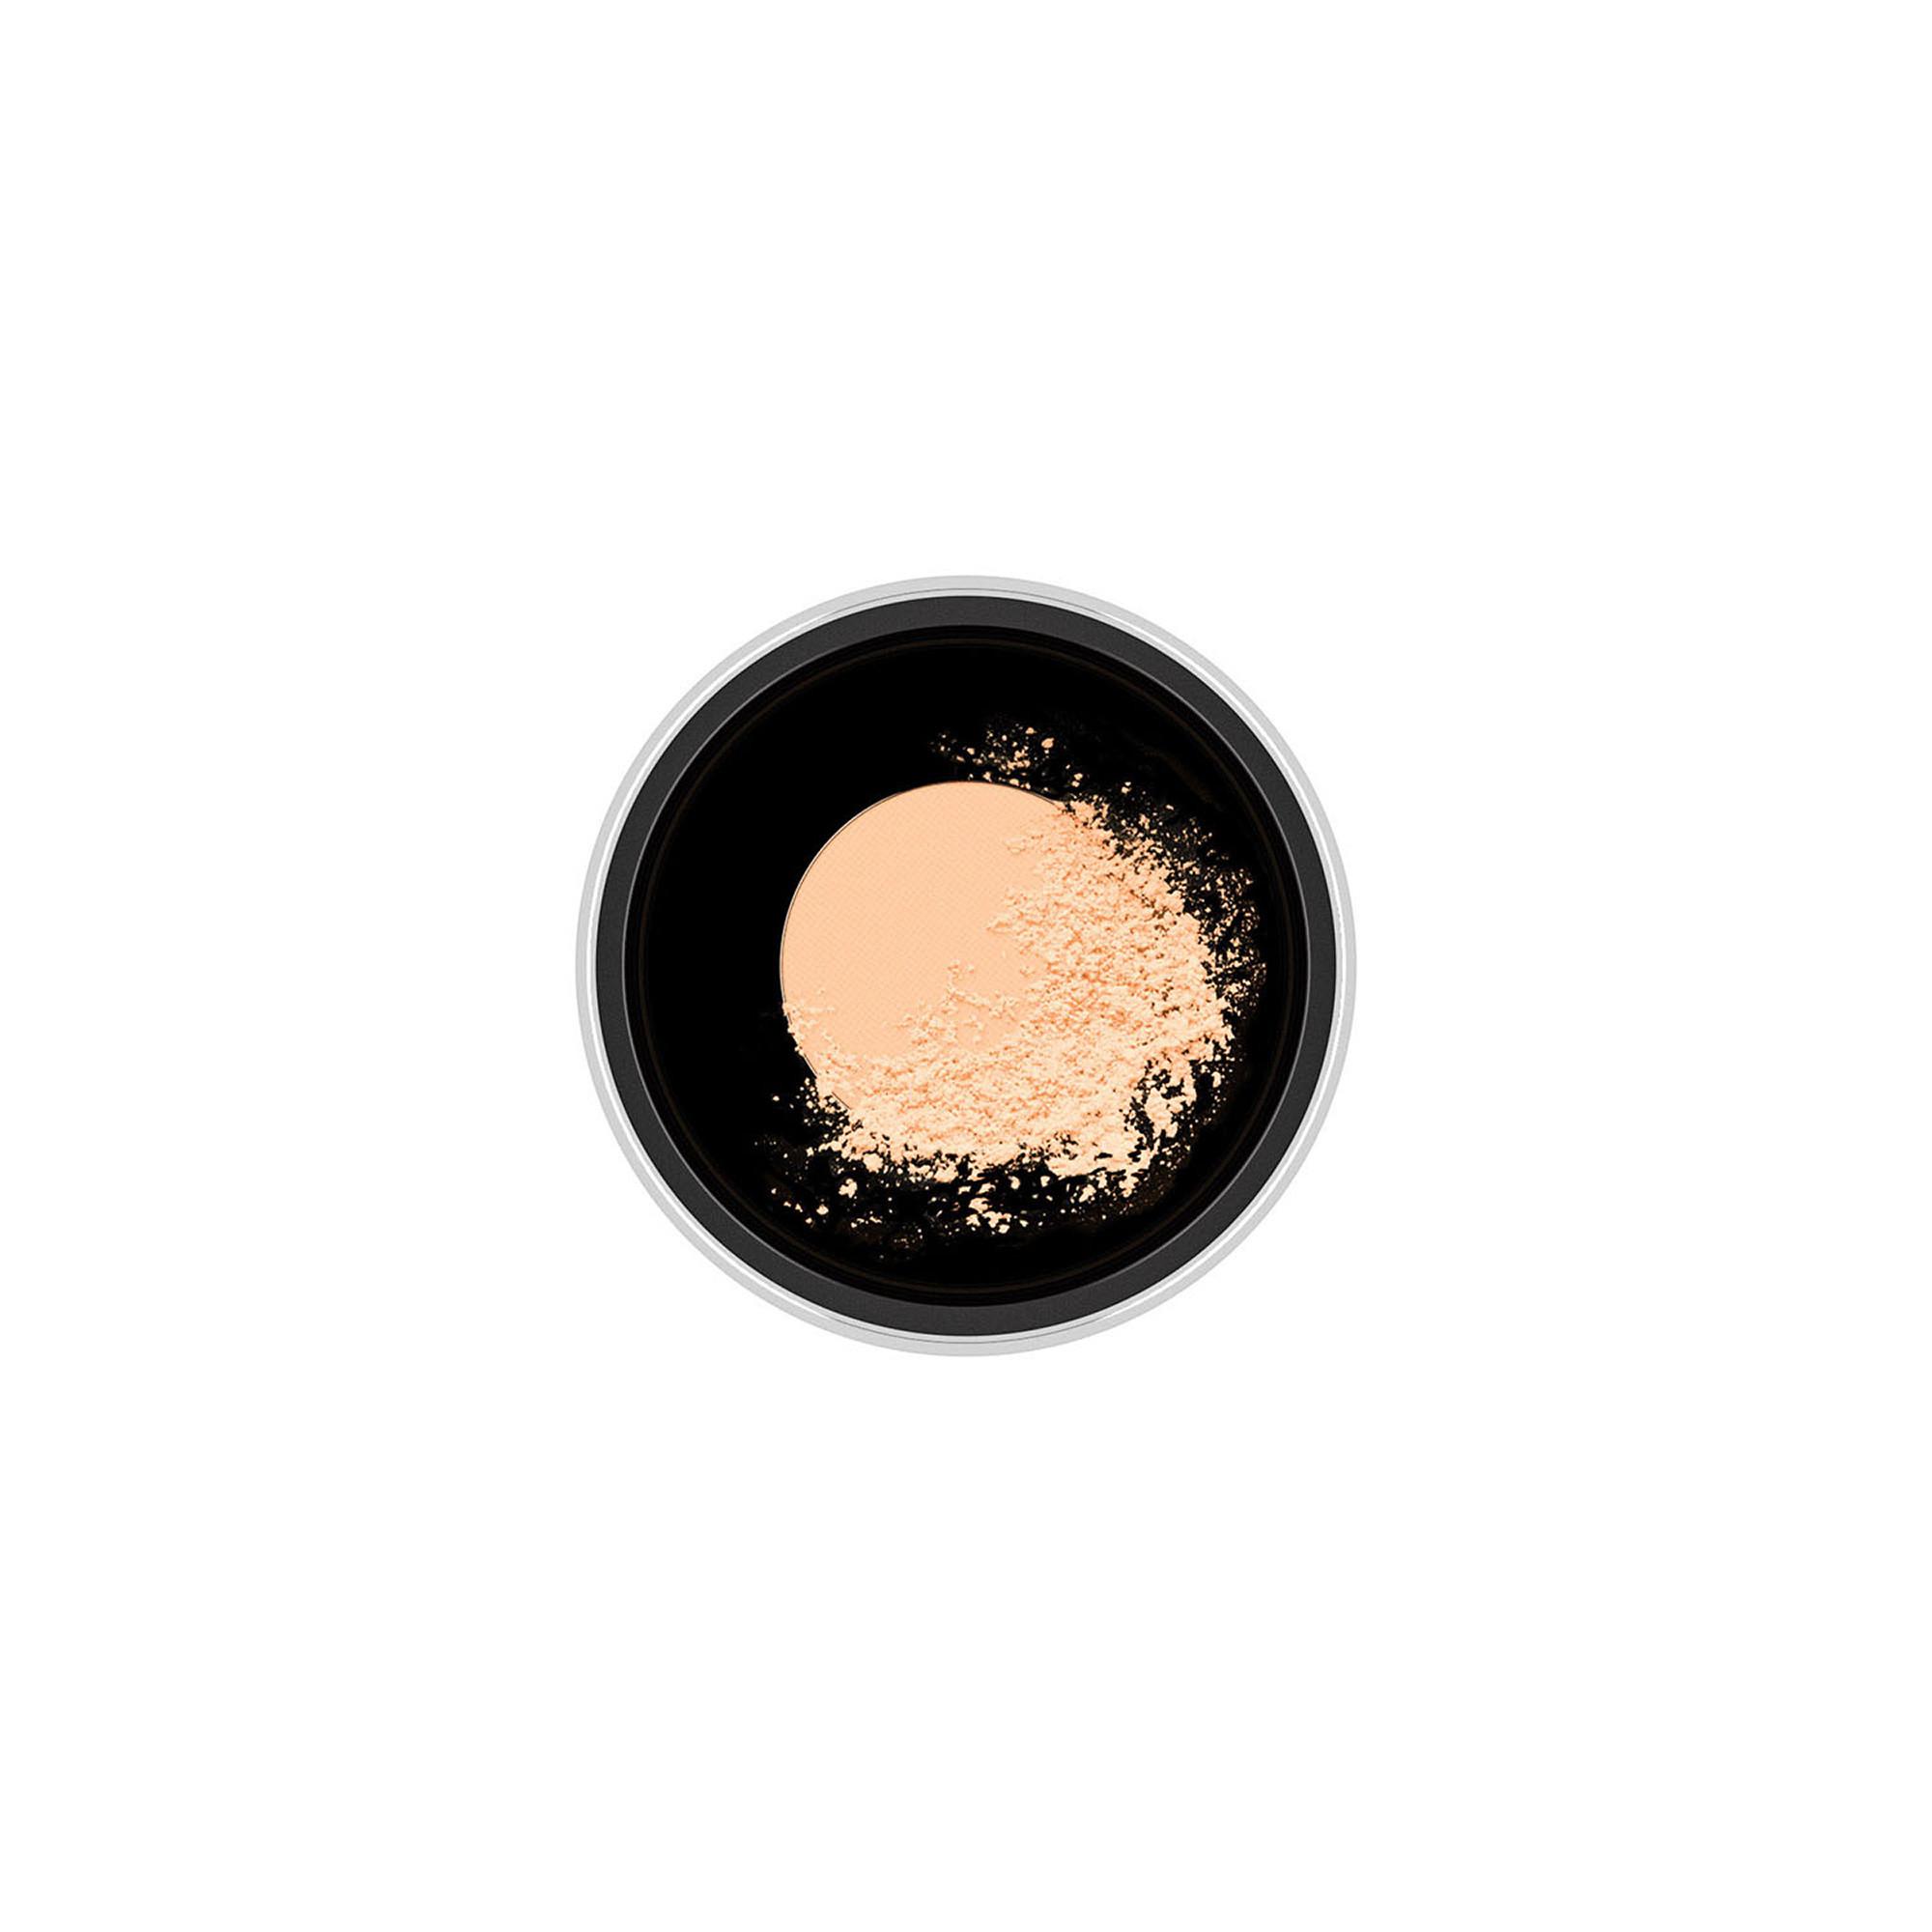 Studio Fix Perfecting Loose Powder - Light Plus, LIGHT PLUS, large image number 0